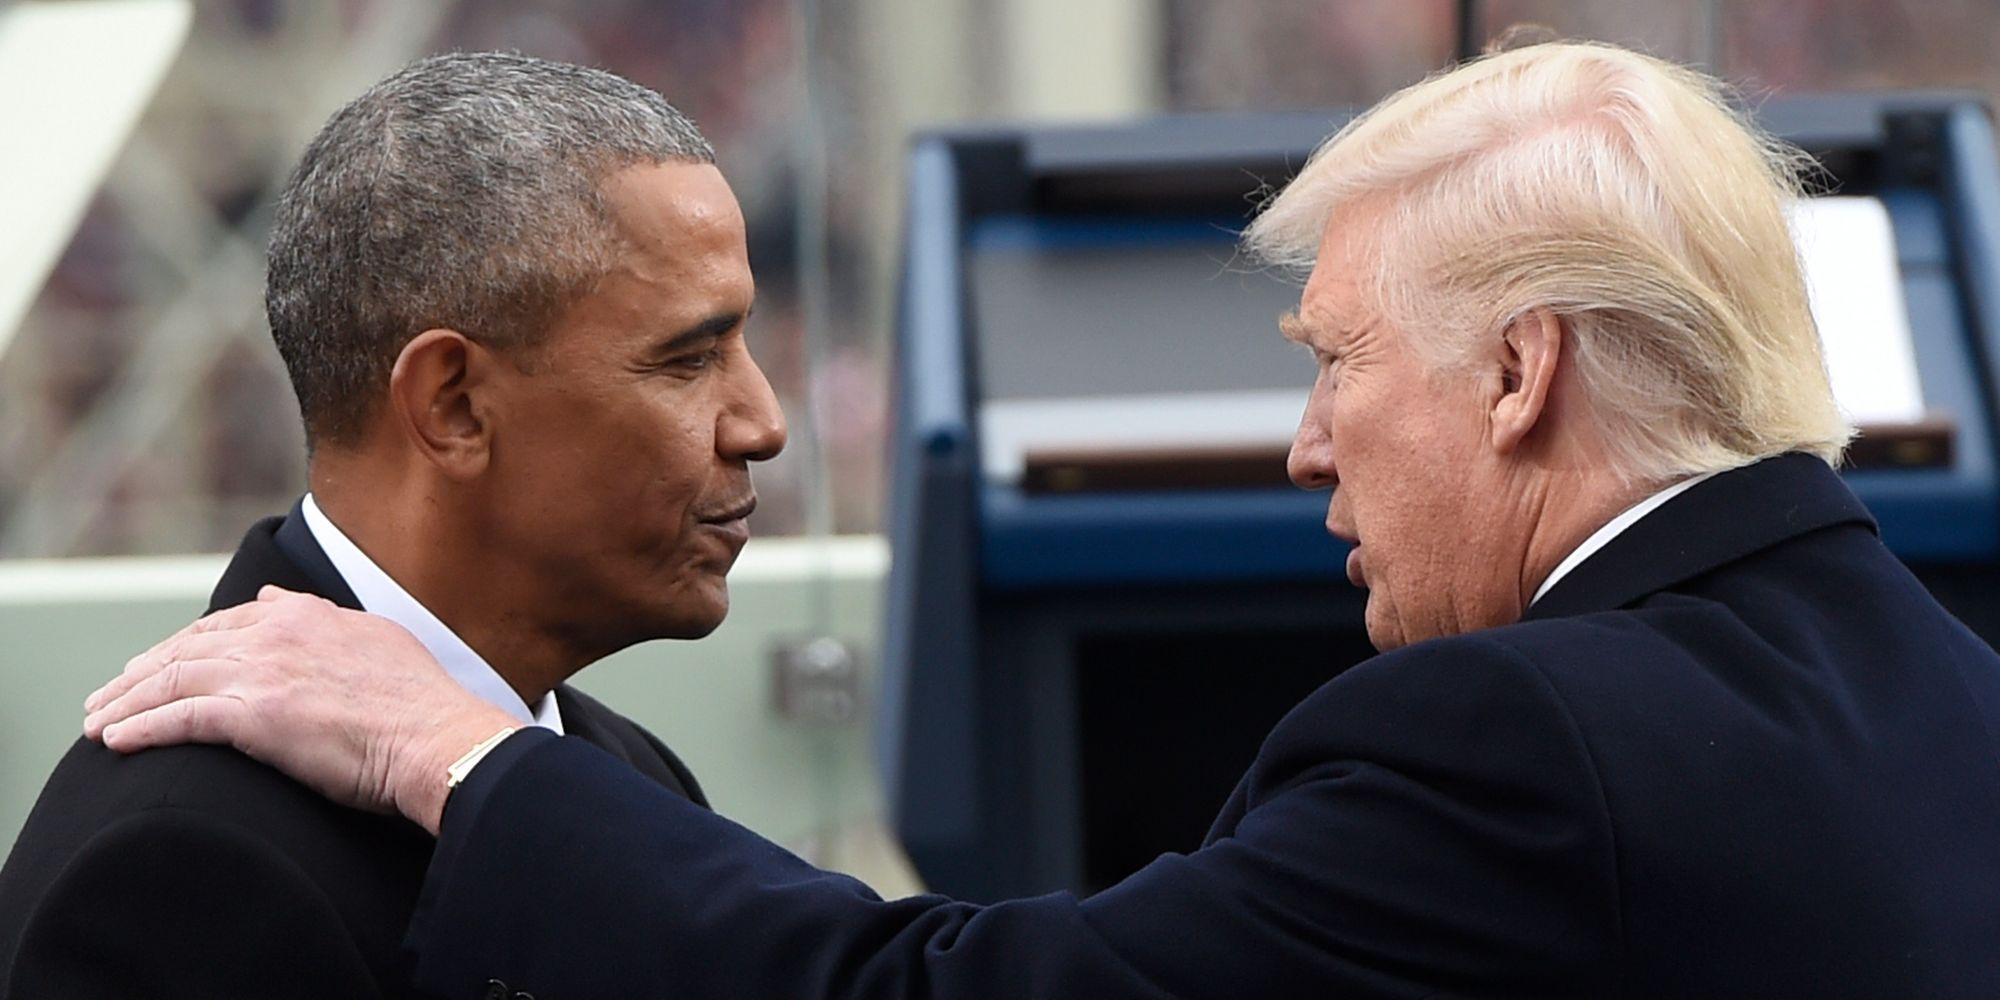 Donald Trump Falsely Blames Barack Obama For Releasing Guantanamo Detainees